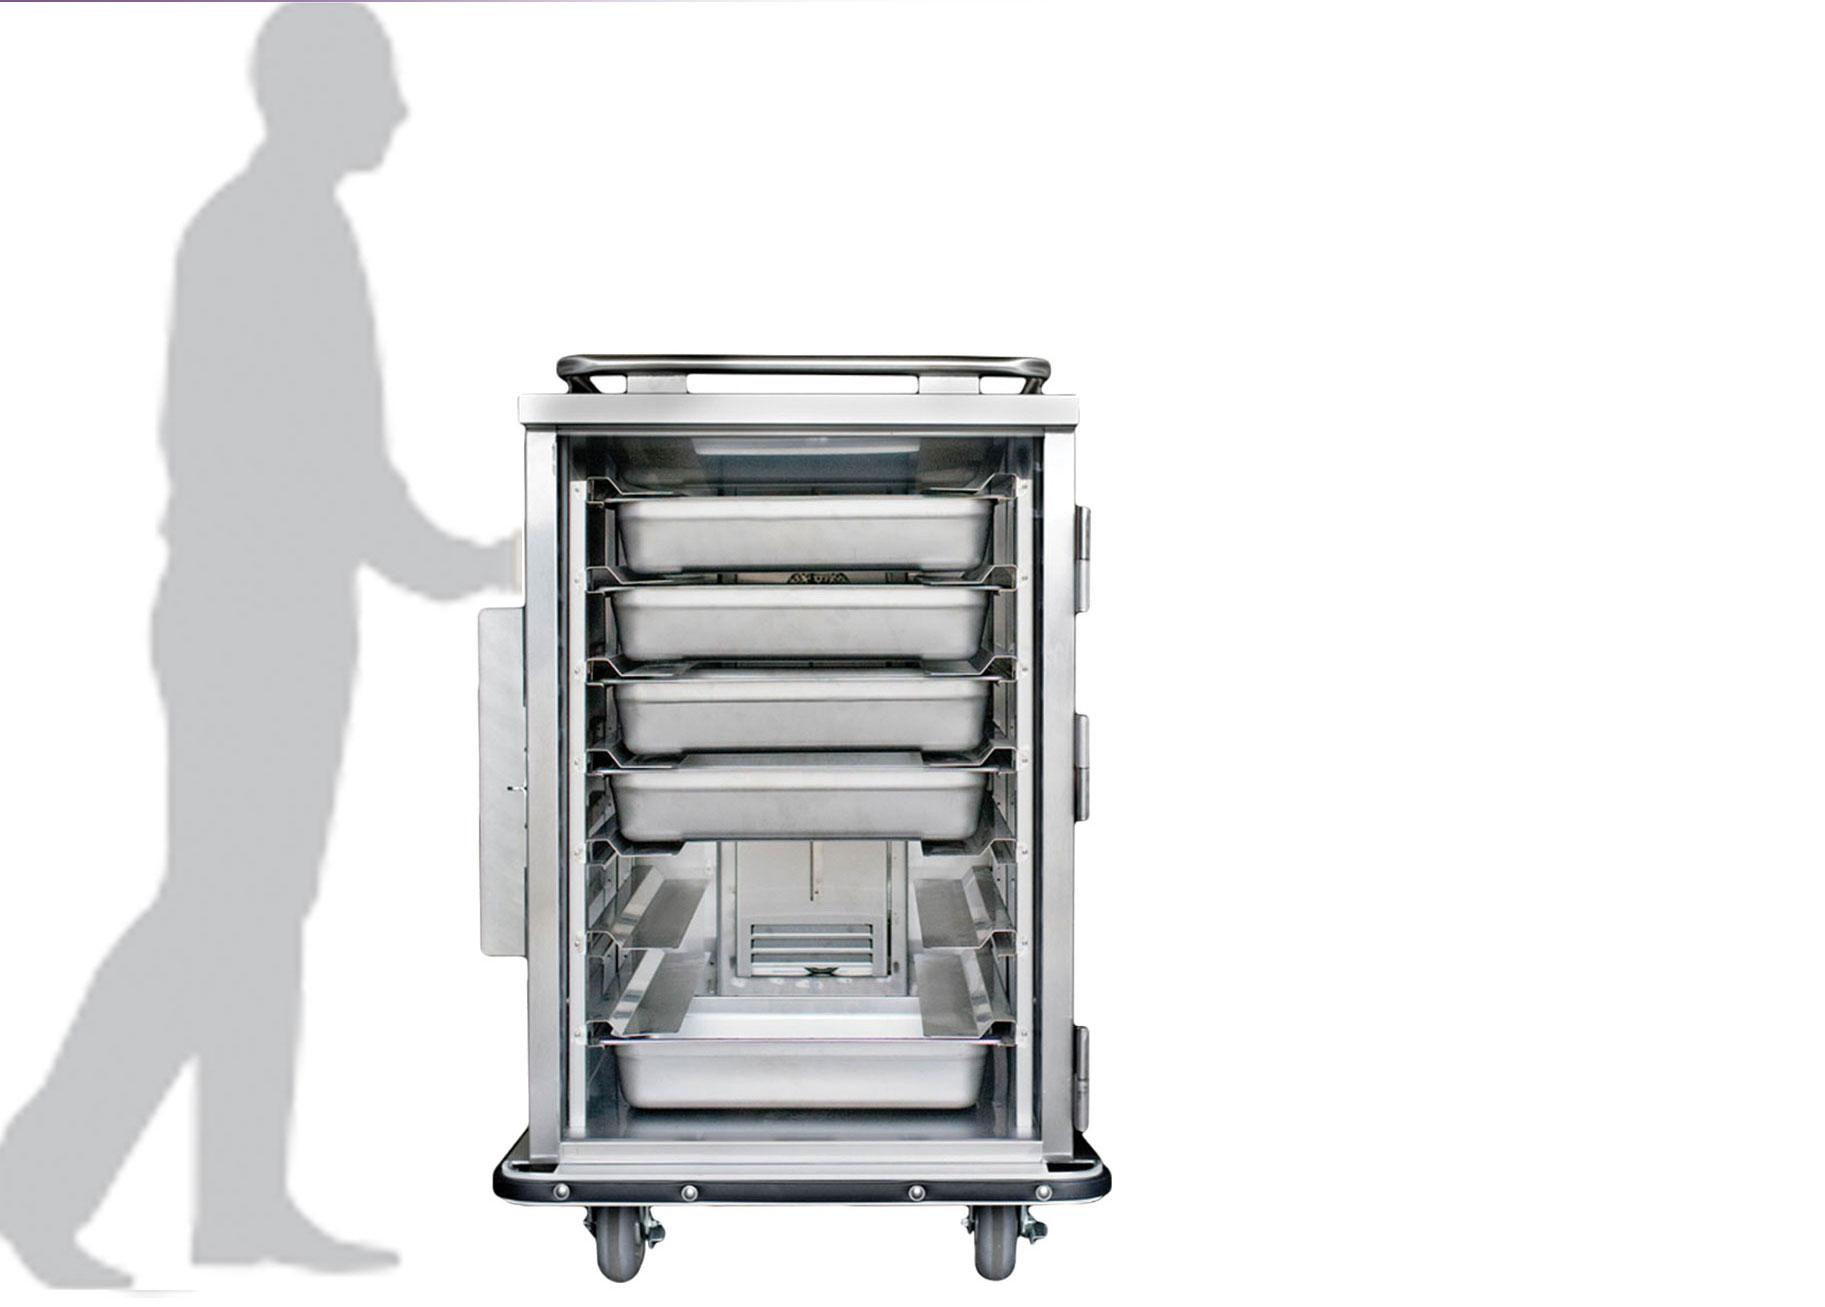 JonesZylon Company Corrections Products Bulk Food Holding Cabinets - Hot food holding cabinet